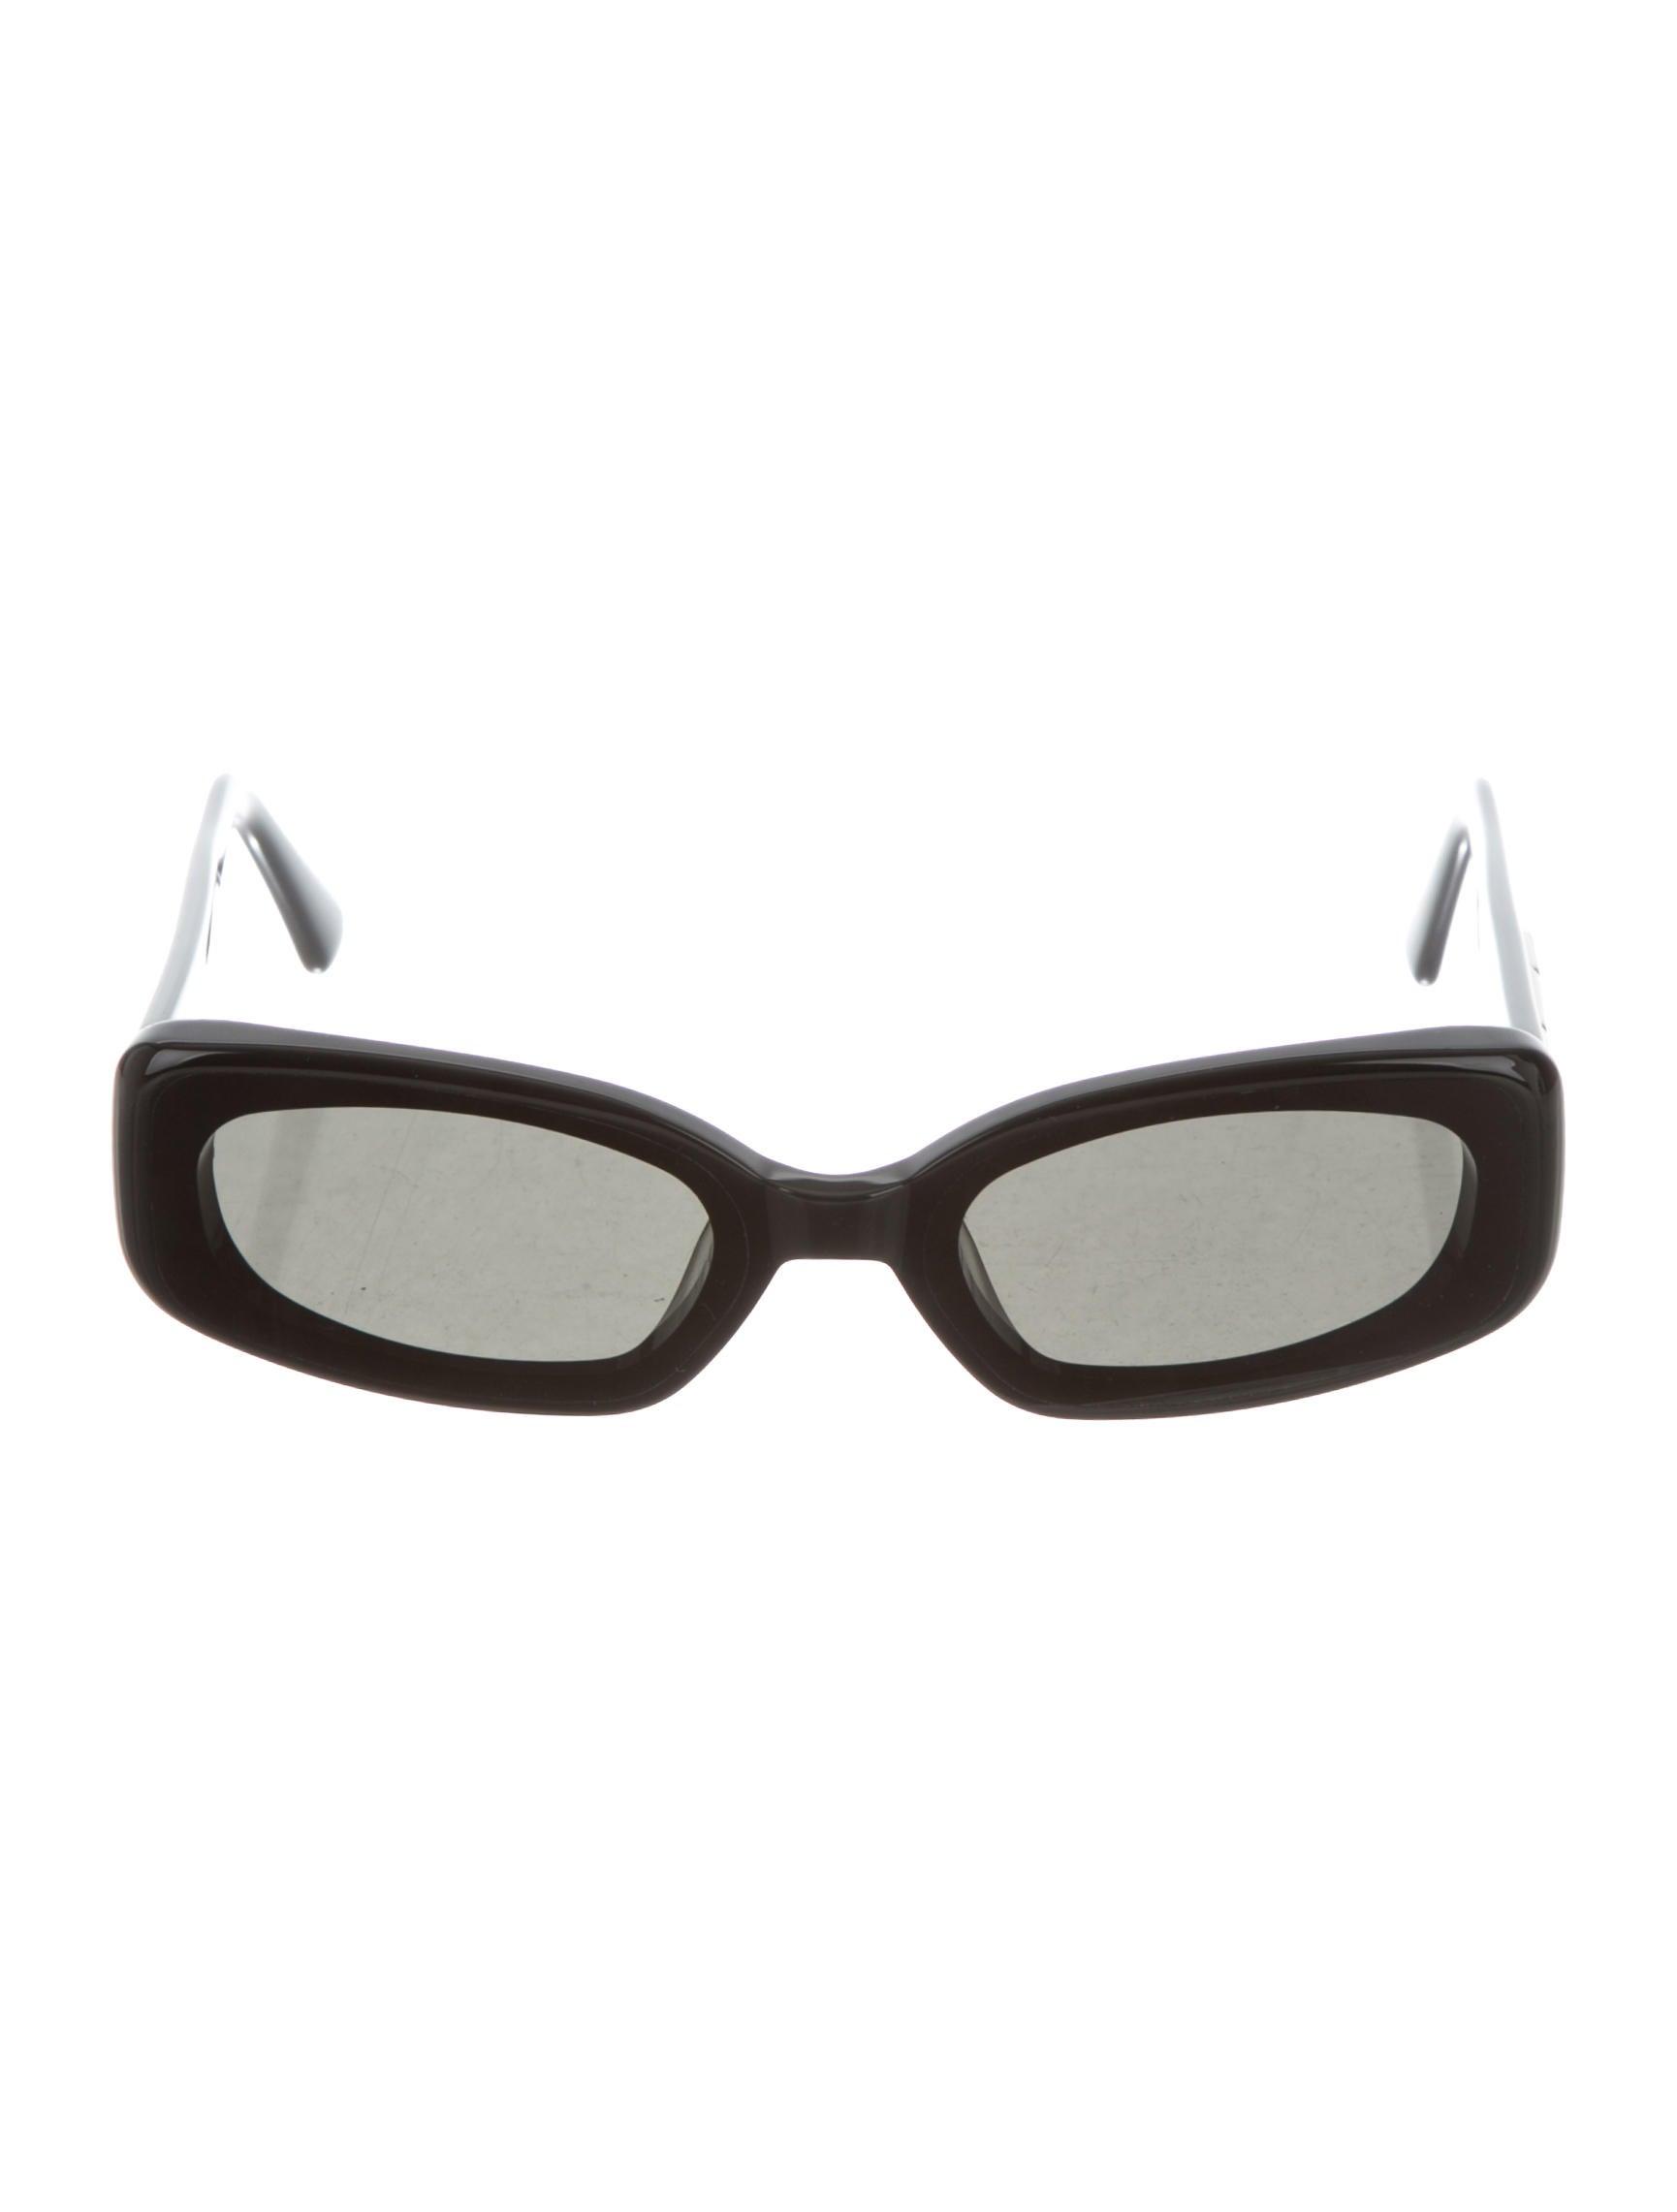 4fb5e3edc2f8 Alexander Wang x Gentle Monster 2018 CEO Sunglasses - Accessories ...